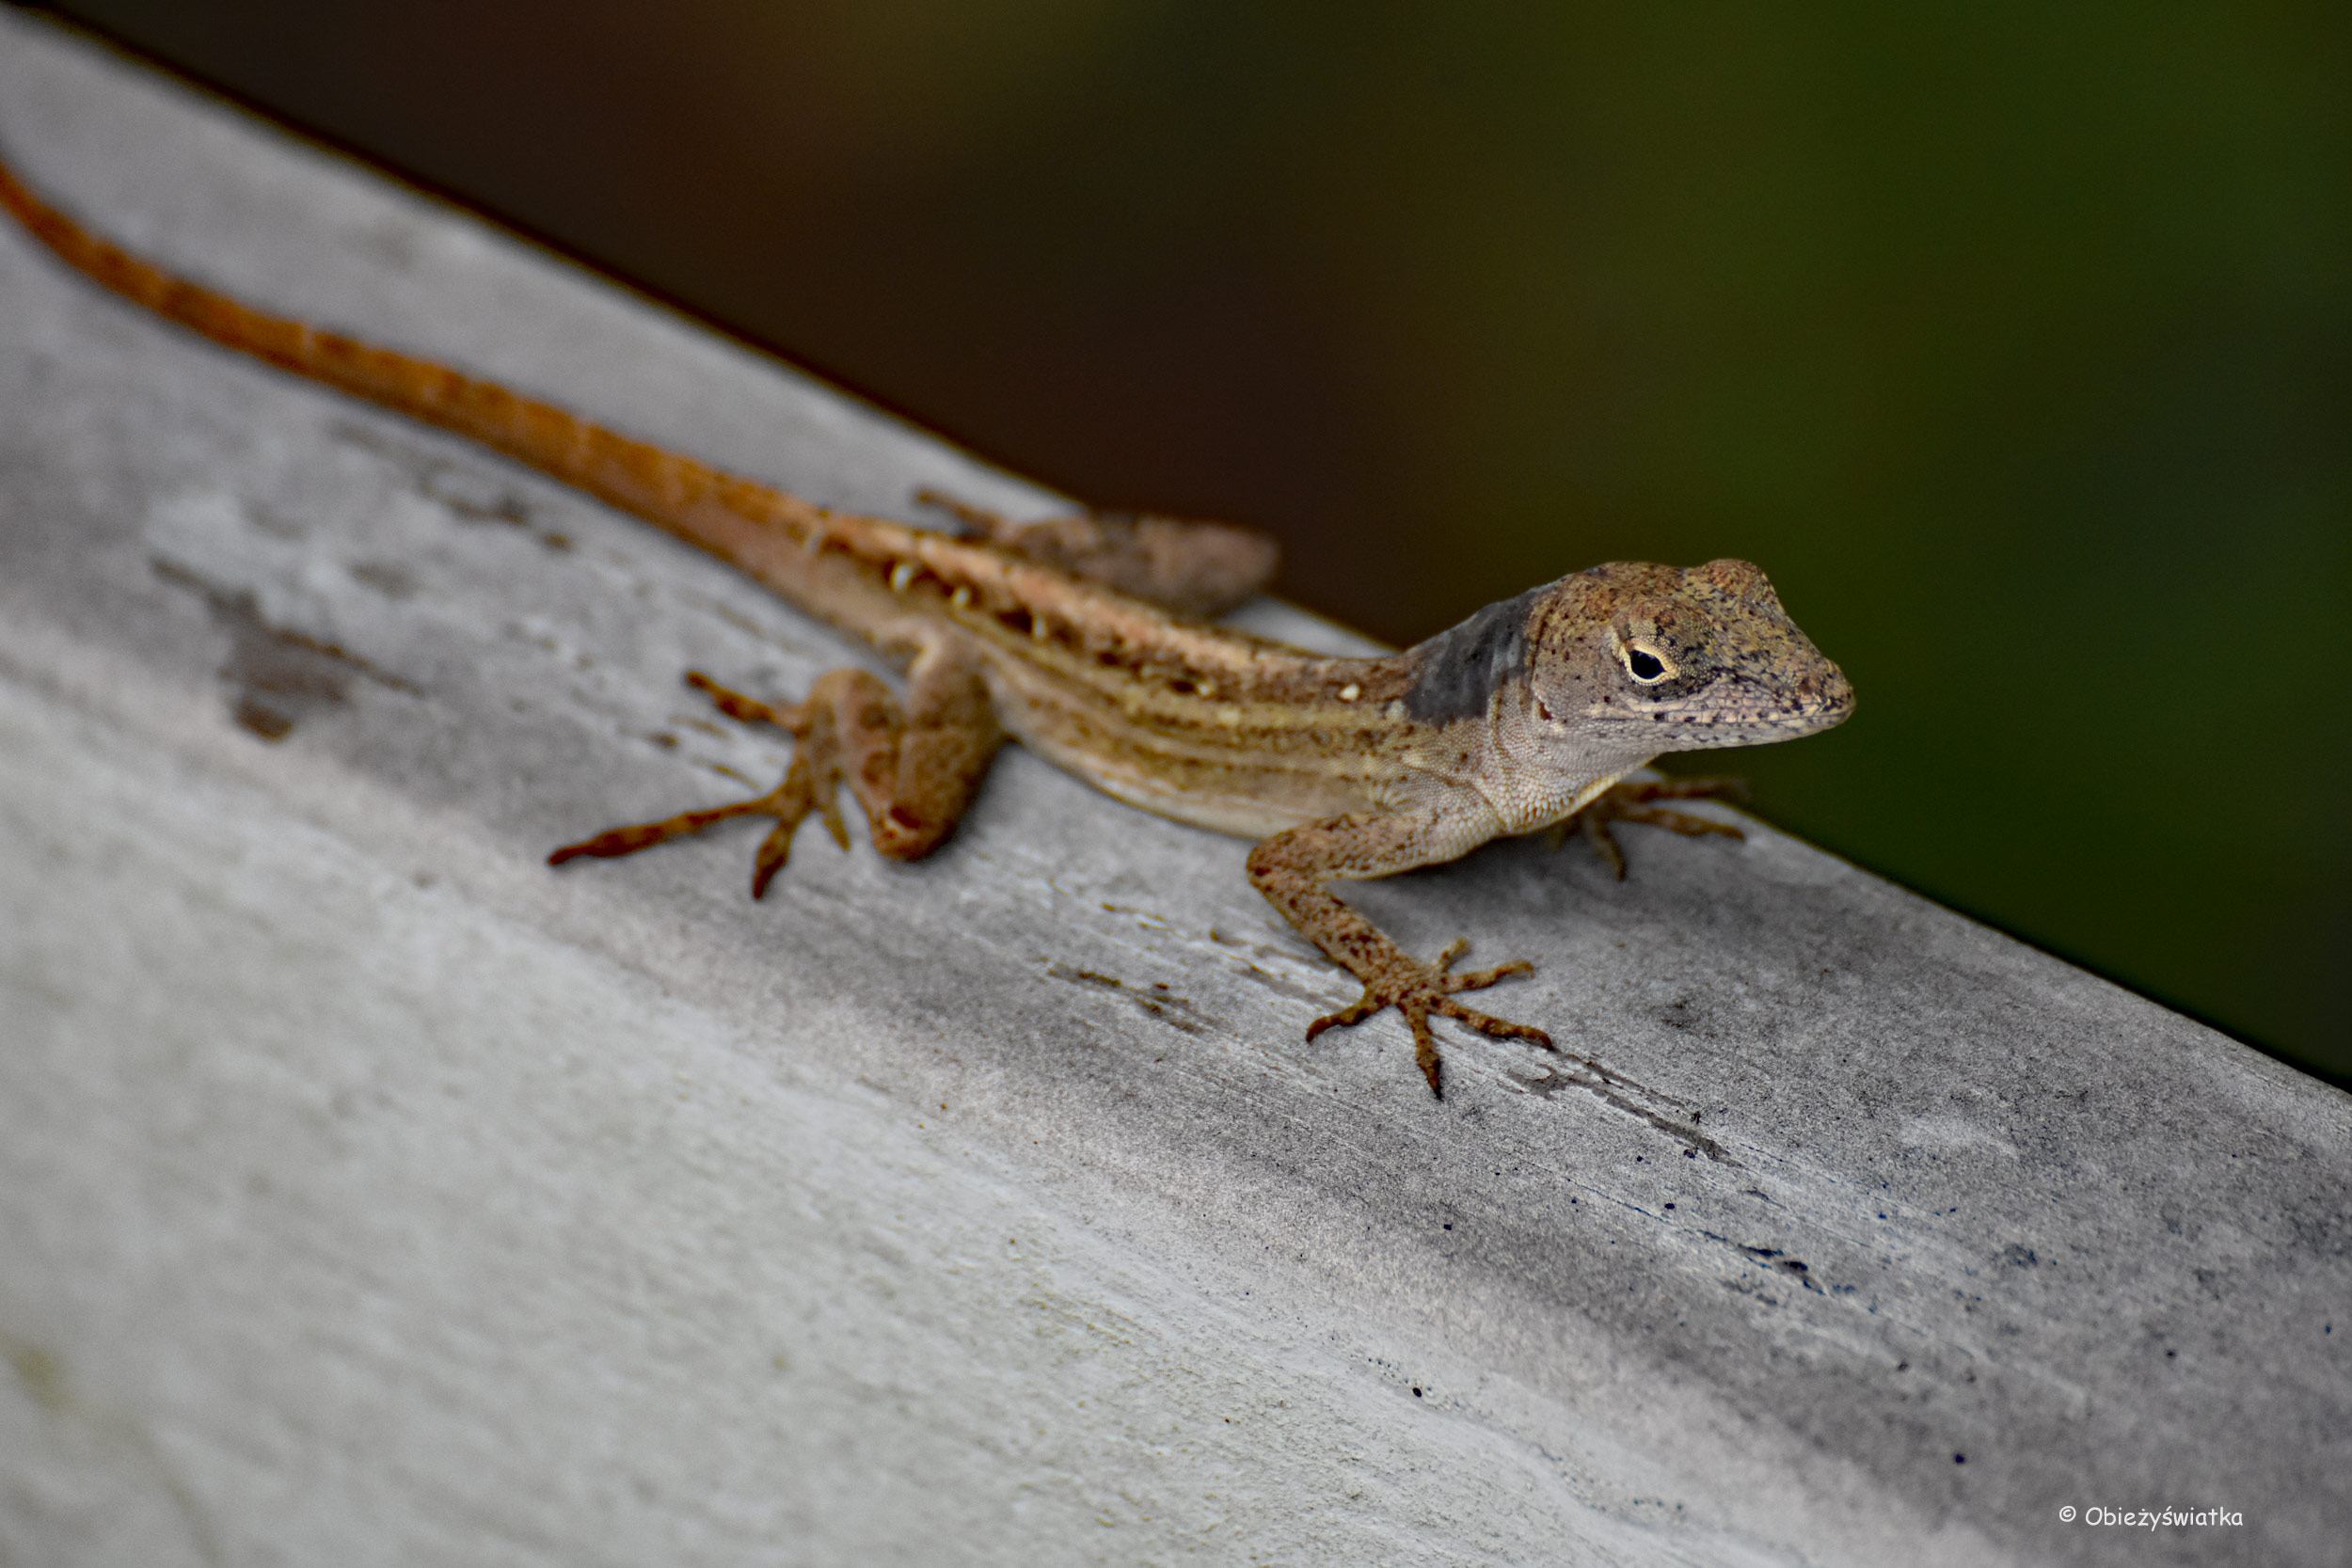 Jaszczurka w bezruchu, Everglades, Floryda